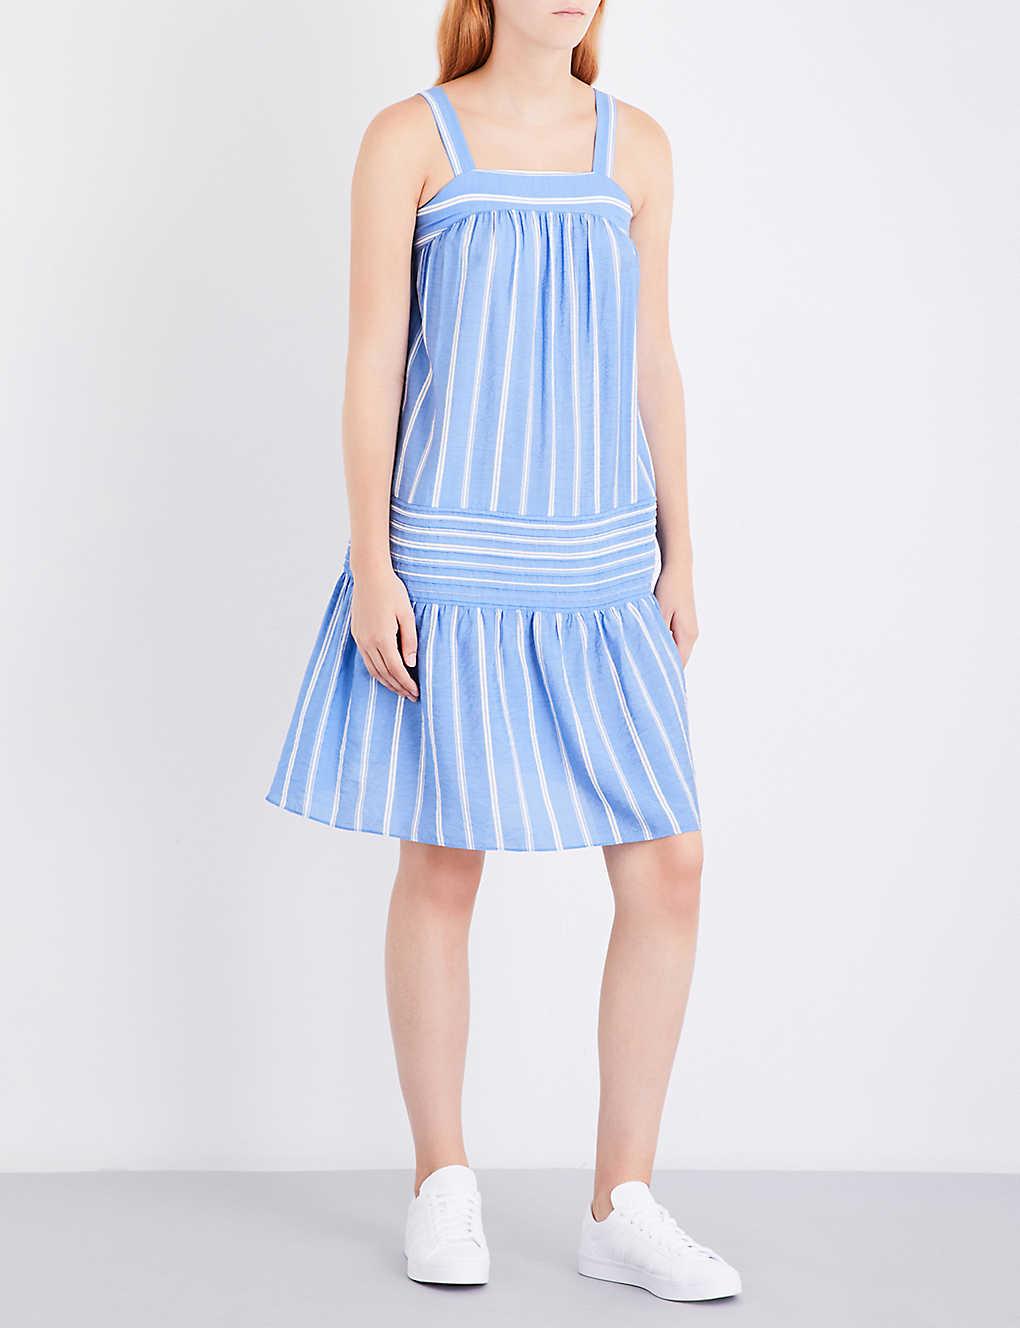 65d7989fb37 WHISTLES - Simone striped woven sun dress